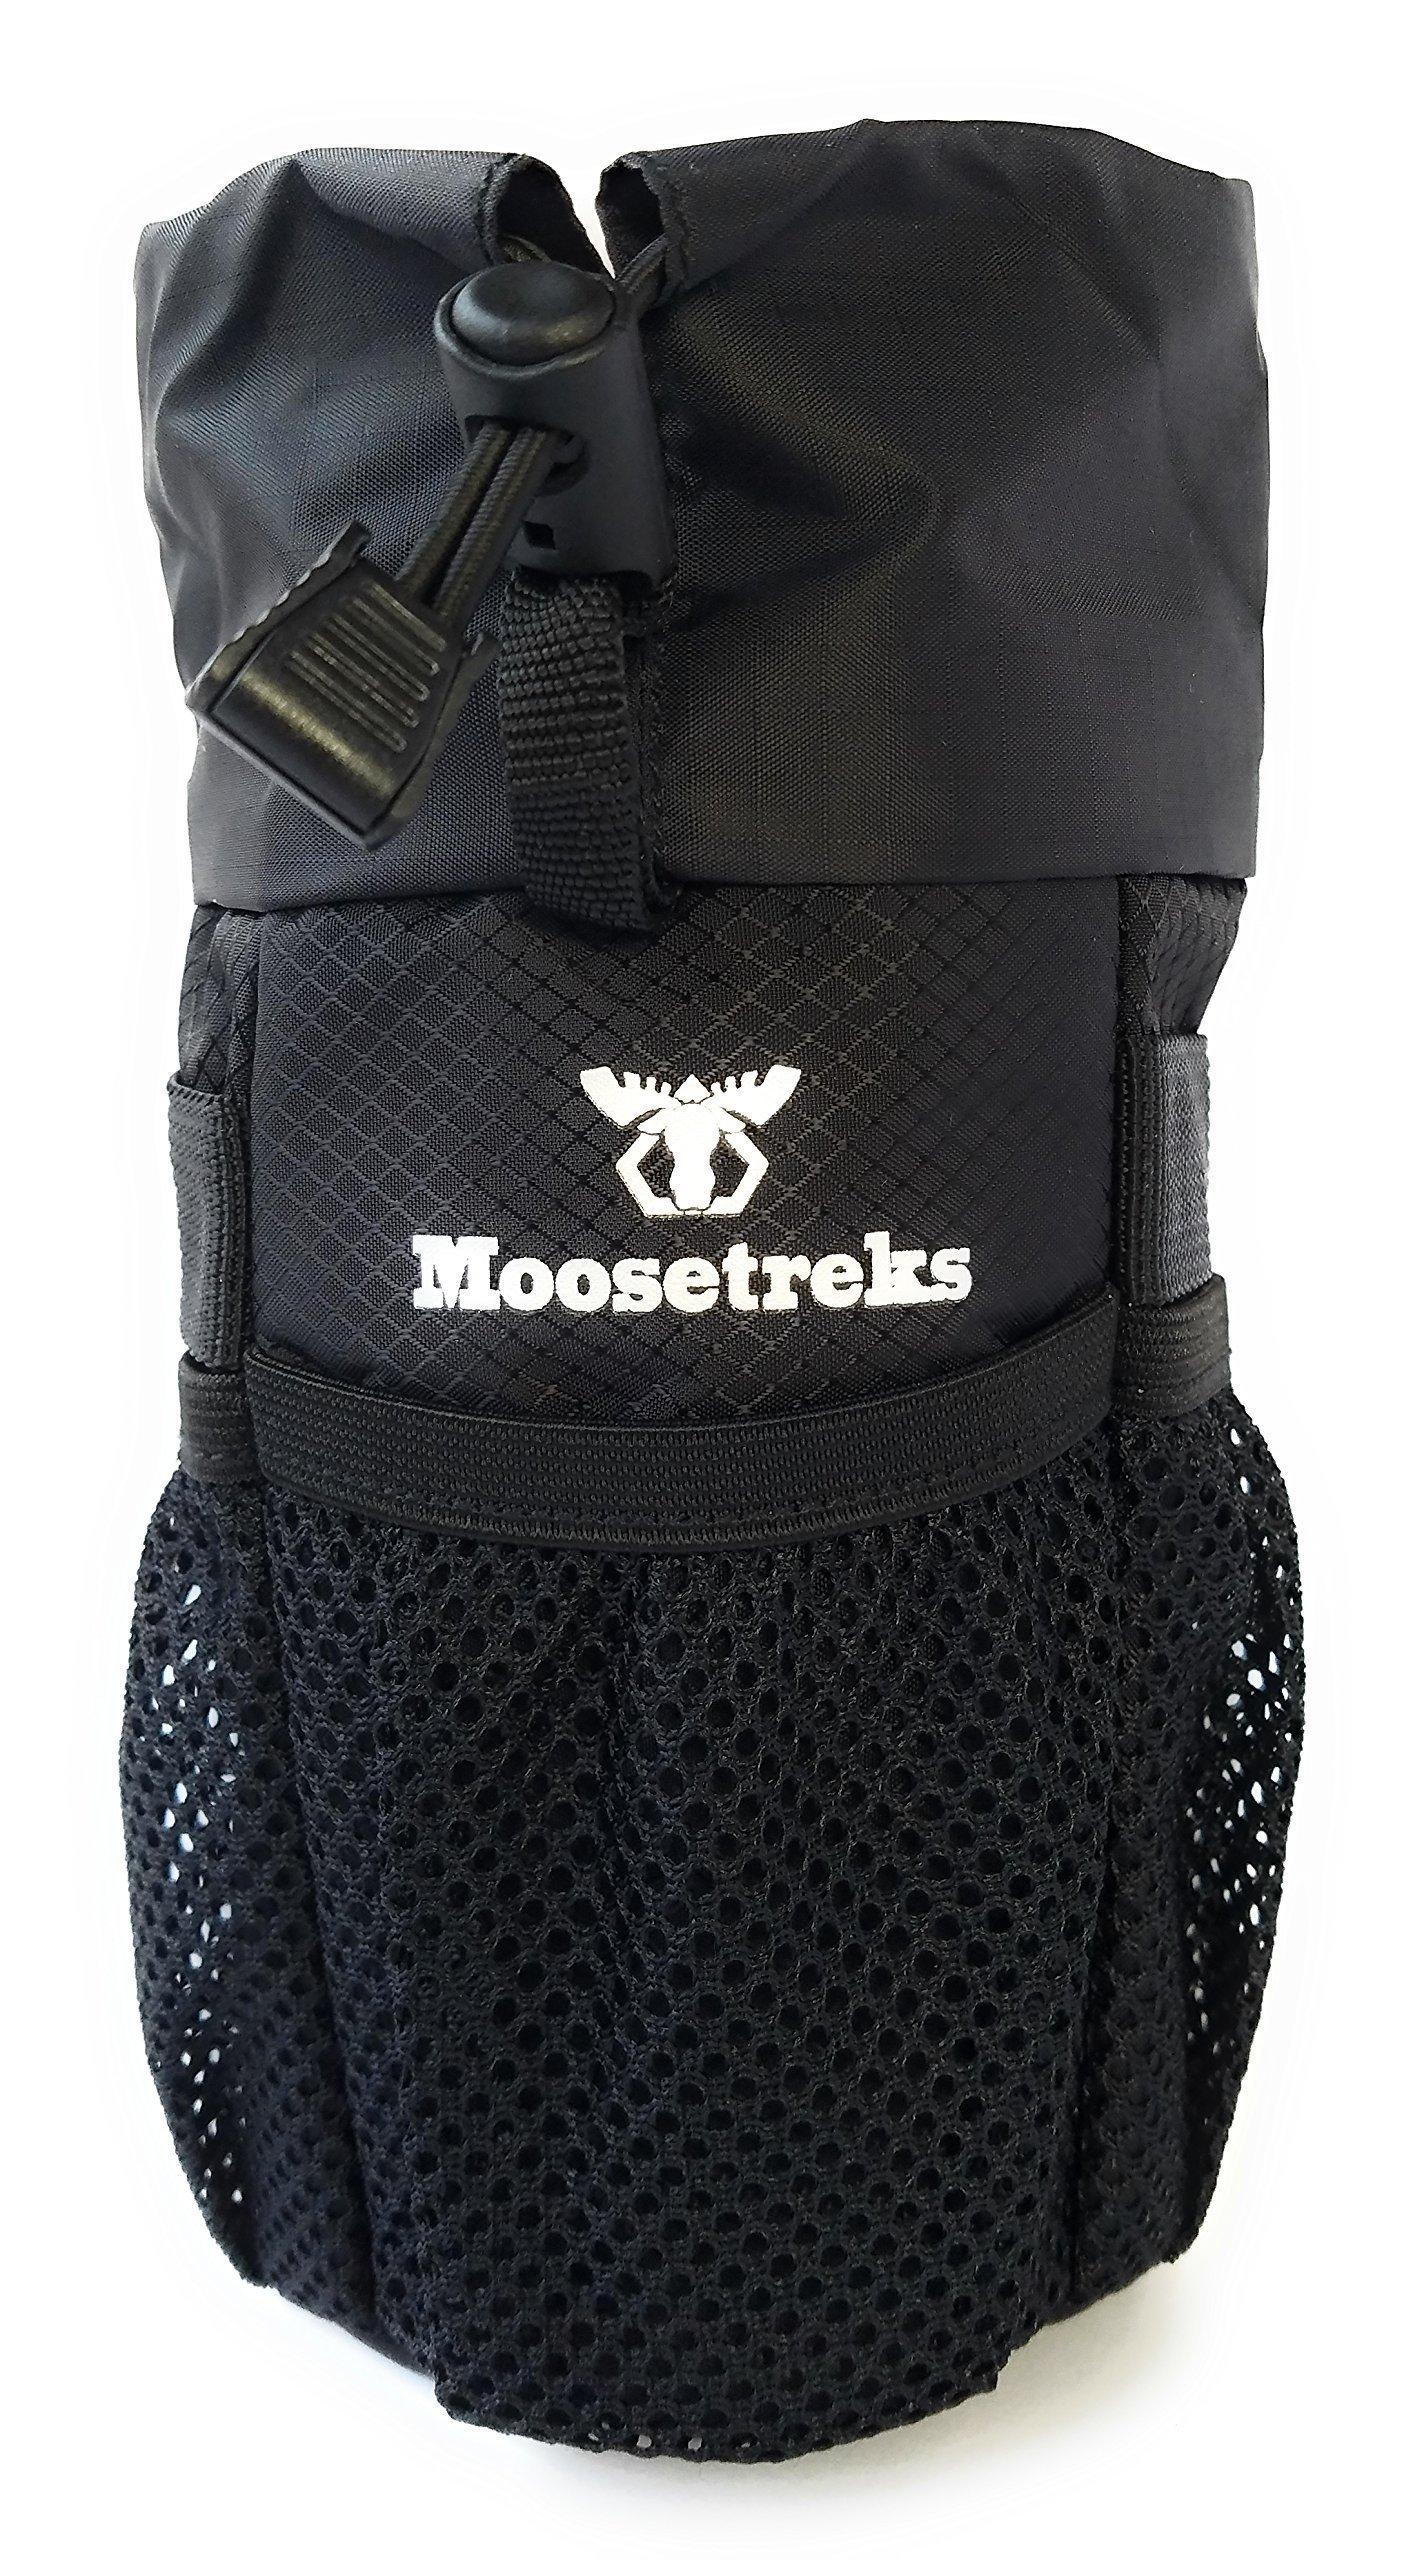 Moosetreks Bike Handlebar Stem Bag | Food Snack Storage, Water Bottle Holder | Bikepacking, Bicycle Touring, Commuting, Insulated Pouch